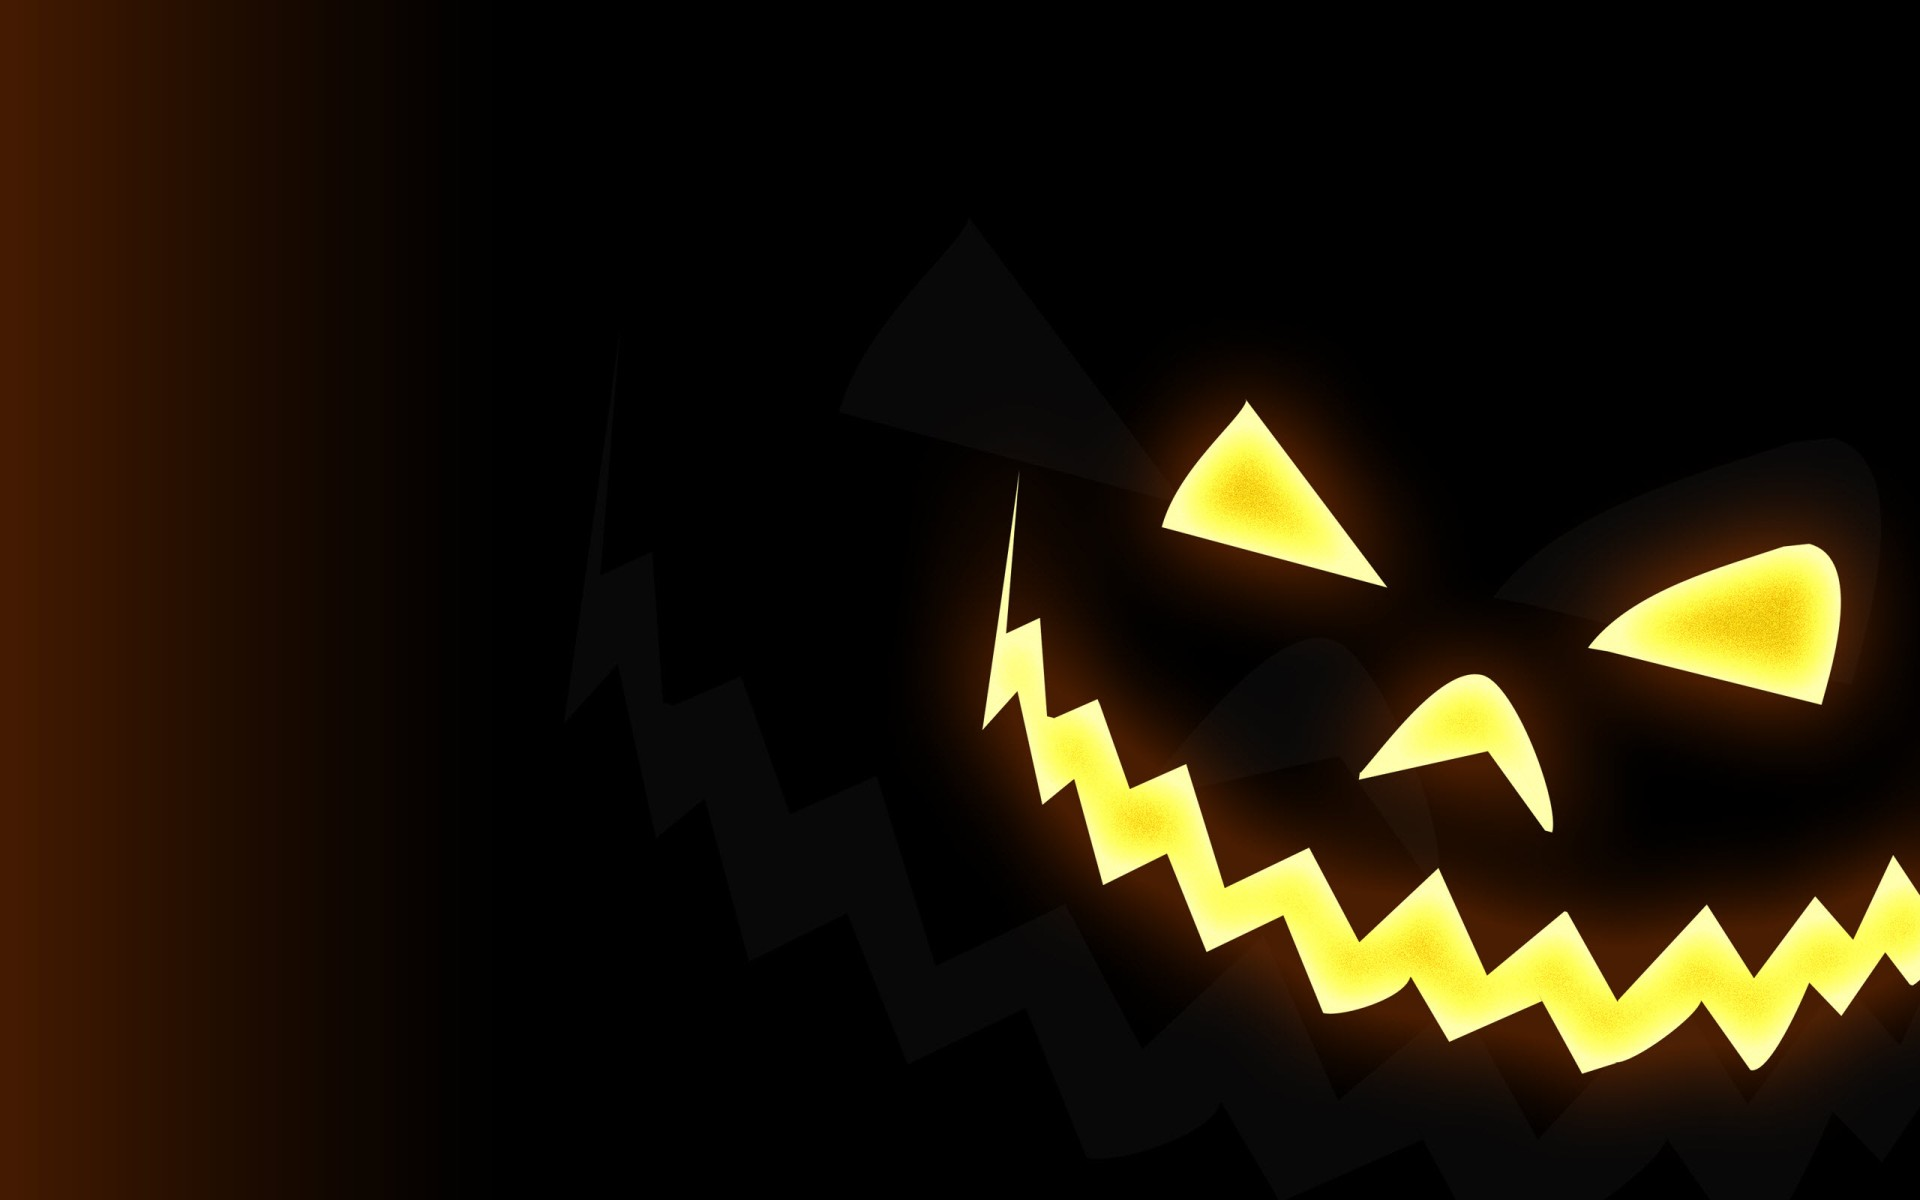 Earth And Moon 3d Wallpaper Free Download Halloween Backgrounds Pixelstalk Net